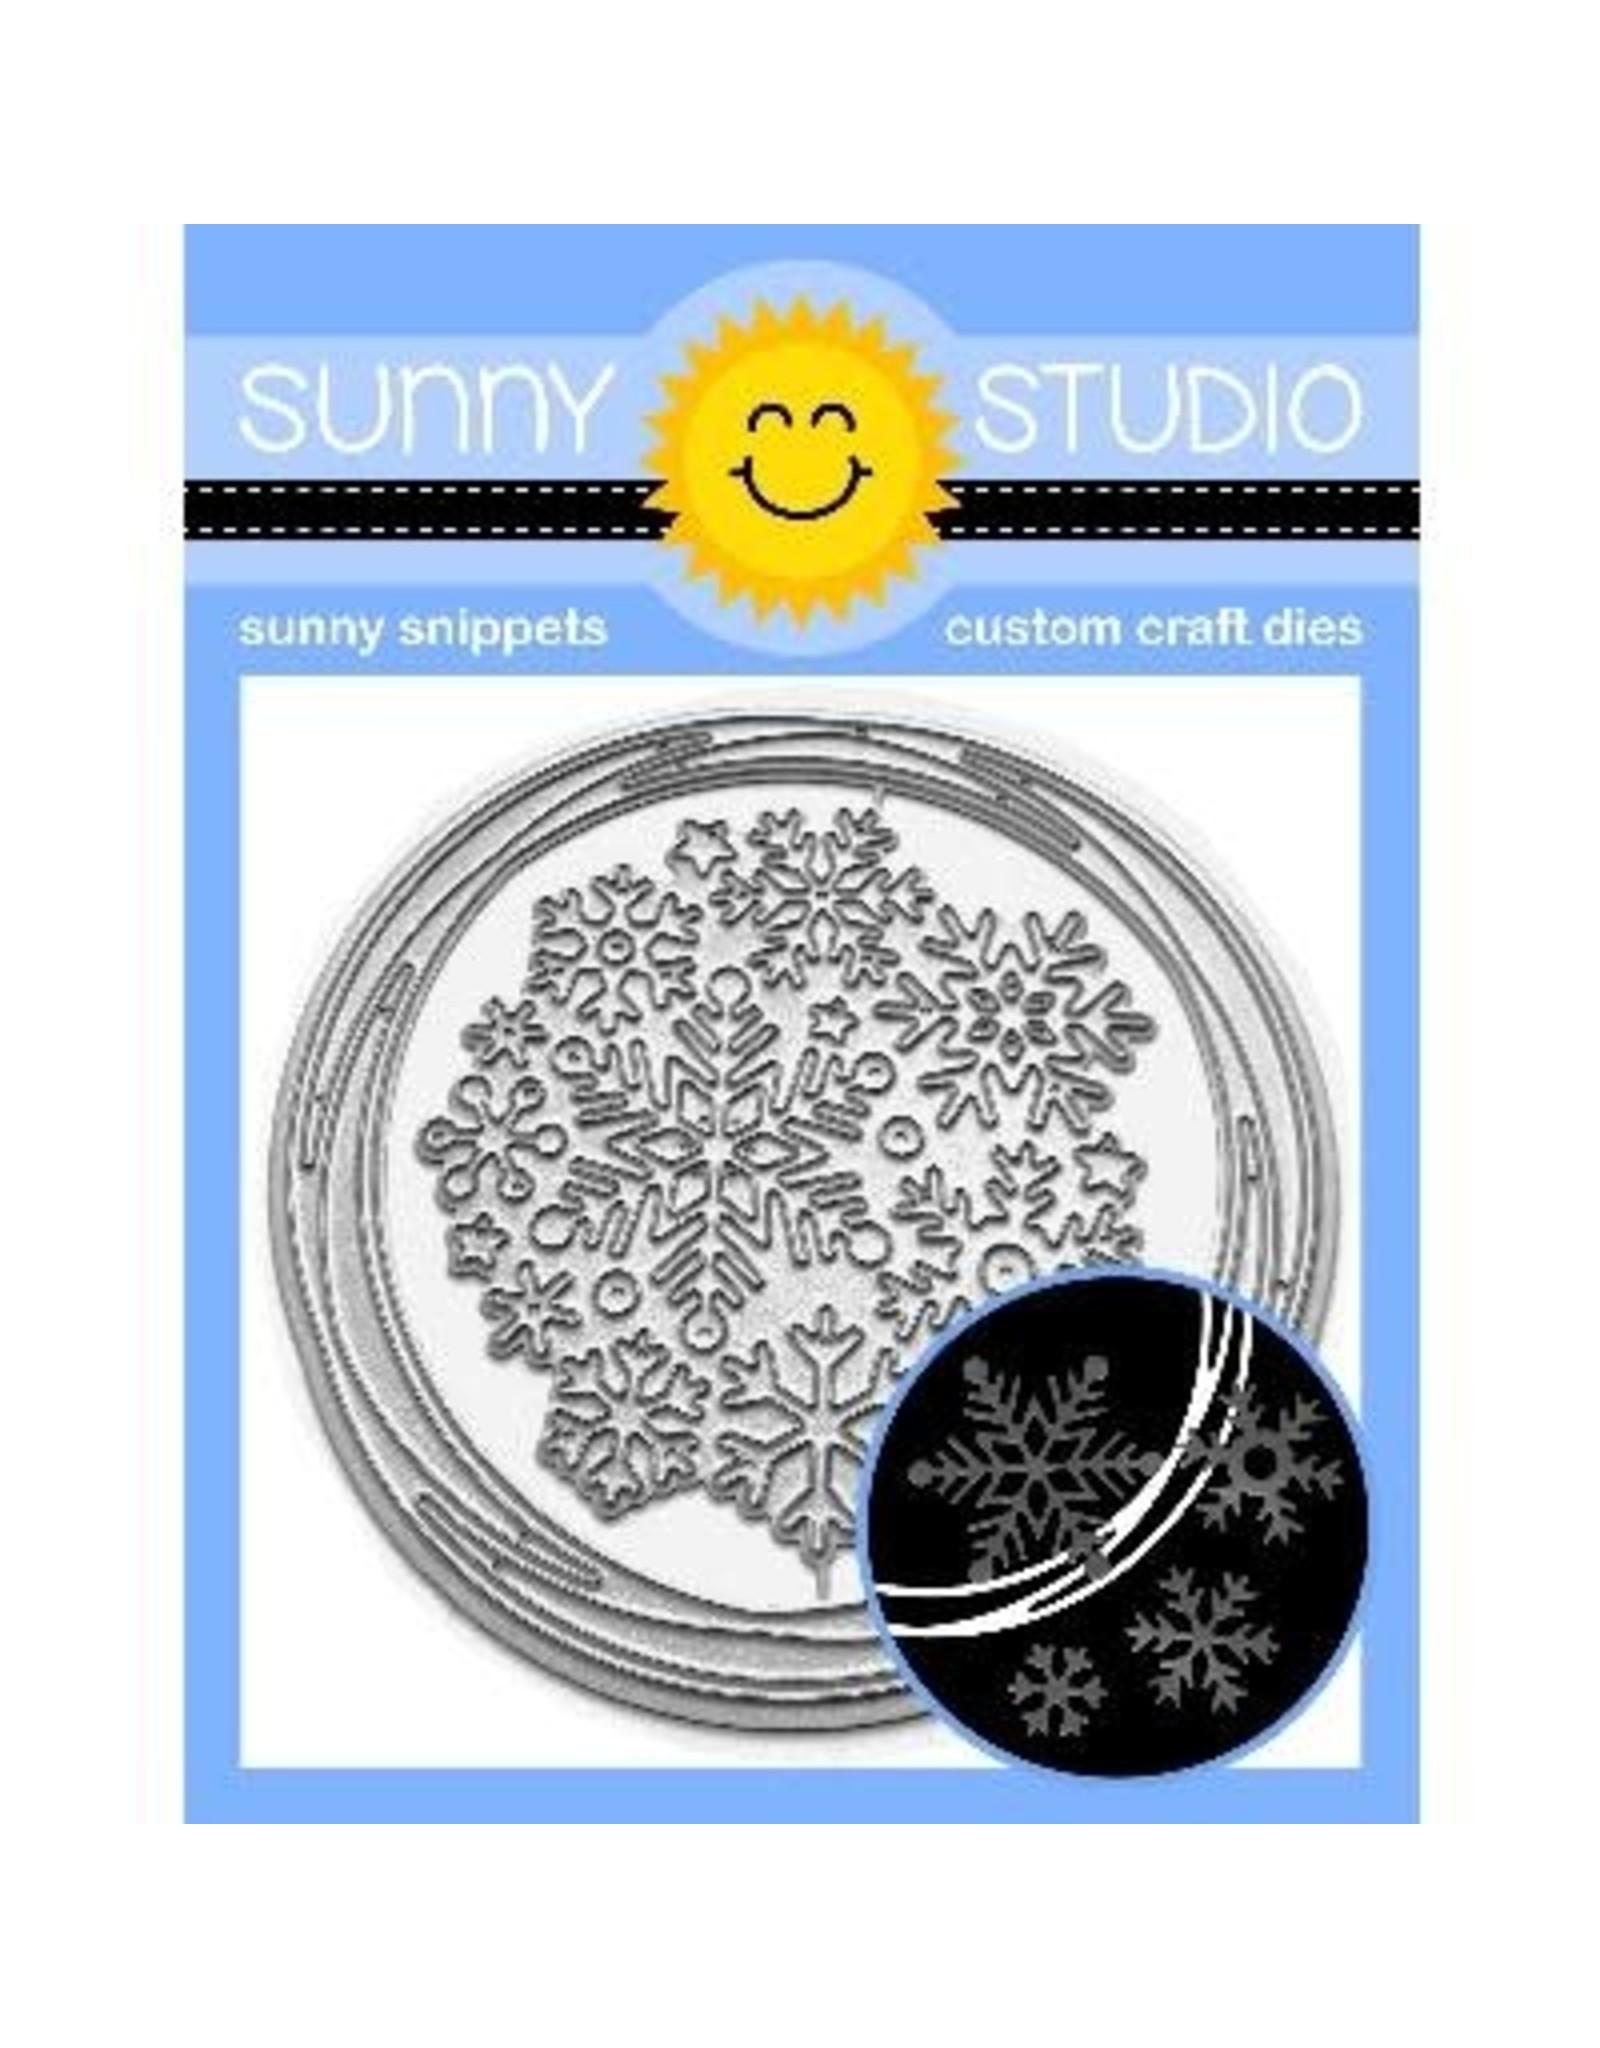 Sunny Studio Snowflake Circle Frame - Die